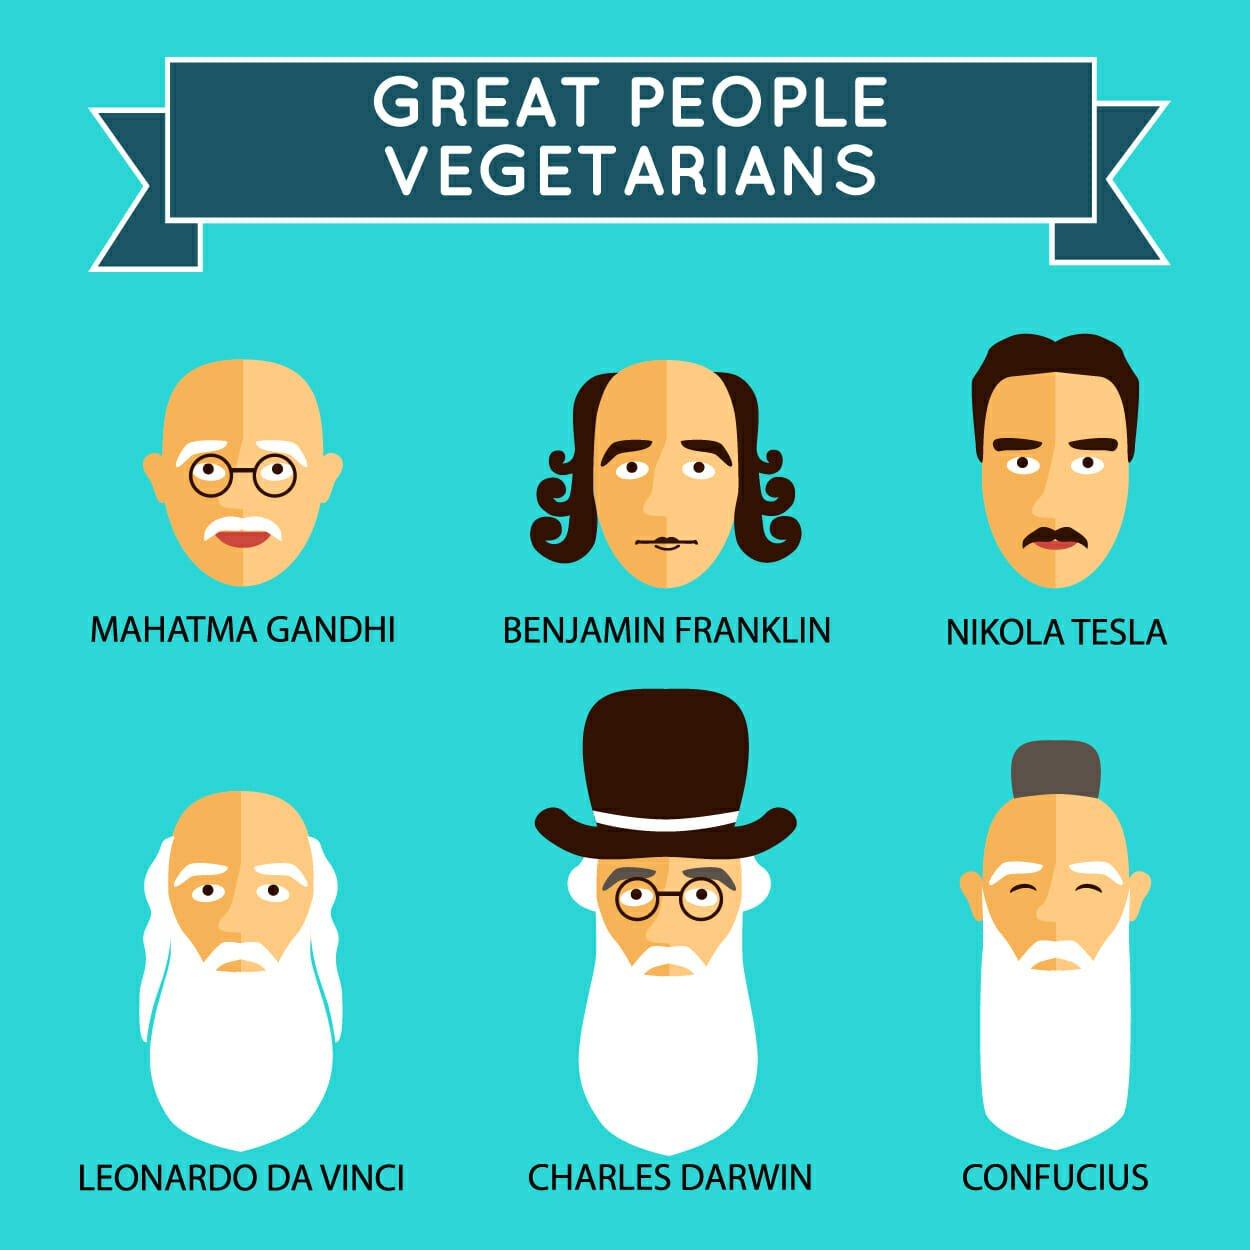 Photo of Sai chi sono i vegetariani celebri nella storia e ai nostri tempi? Ecco tutti i VIP vegetariani